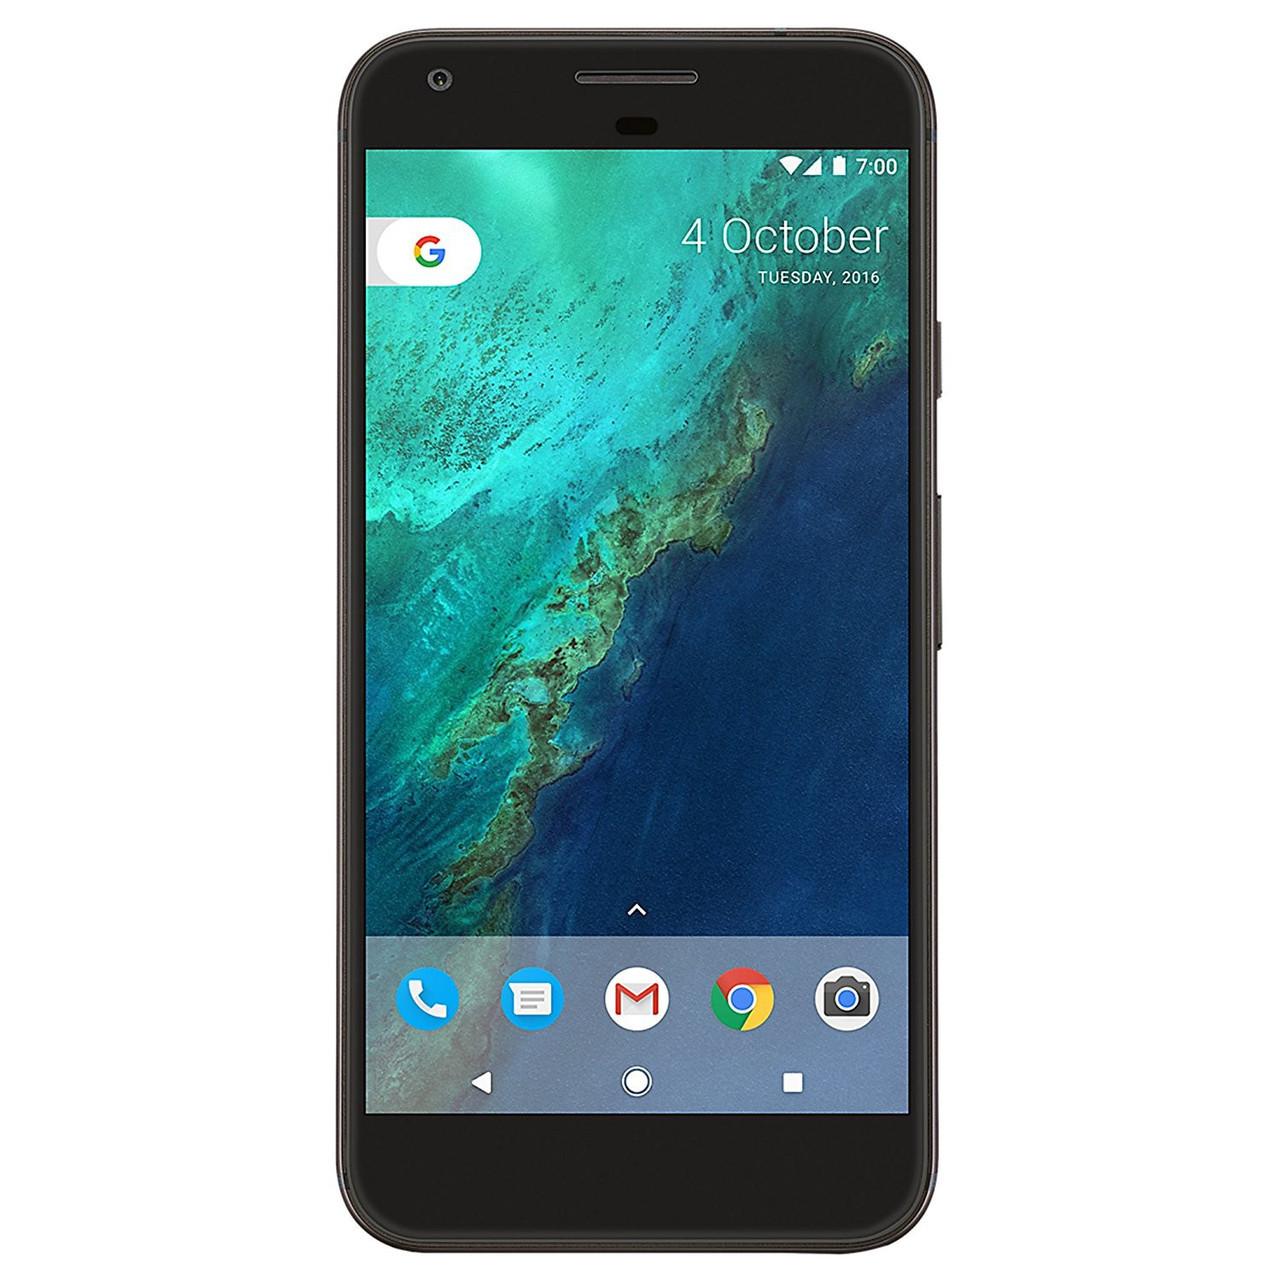 8a663c9032571 Смартфон Google Pixel 32GB (Quite Black) - Интернет-магазин SMUZI MARKET –  доставка